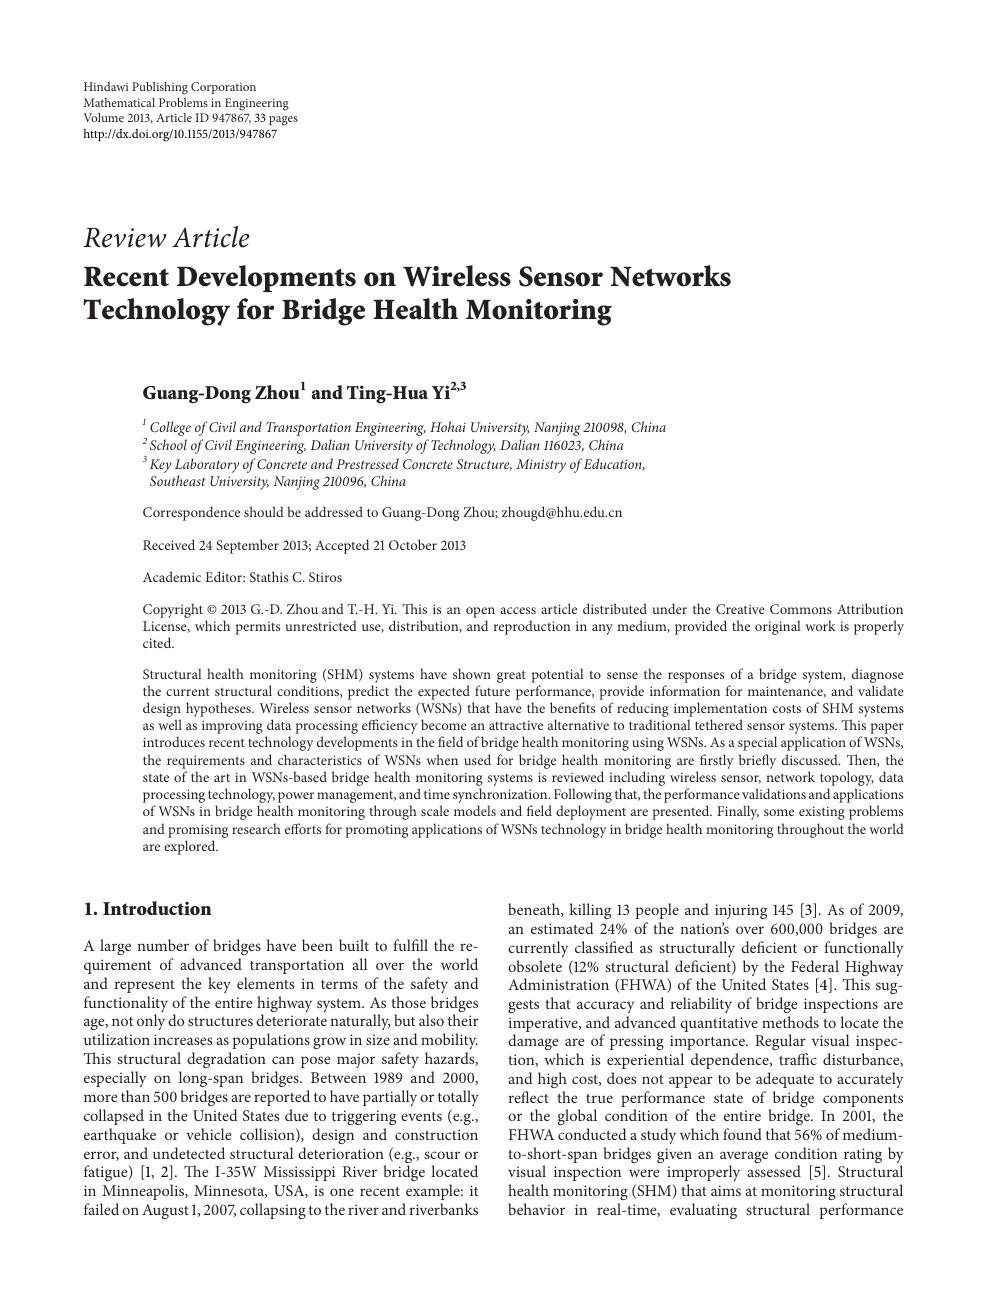 Recent Developments on Wireless Sensor Networks Technology